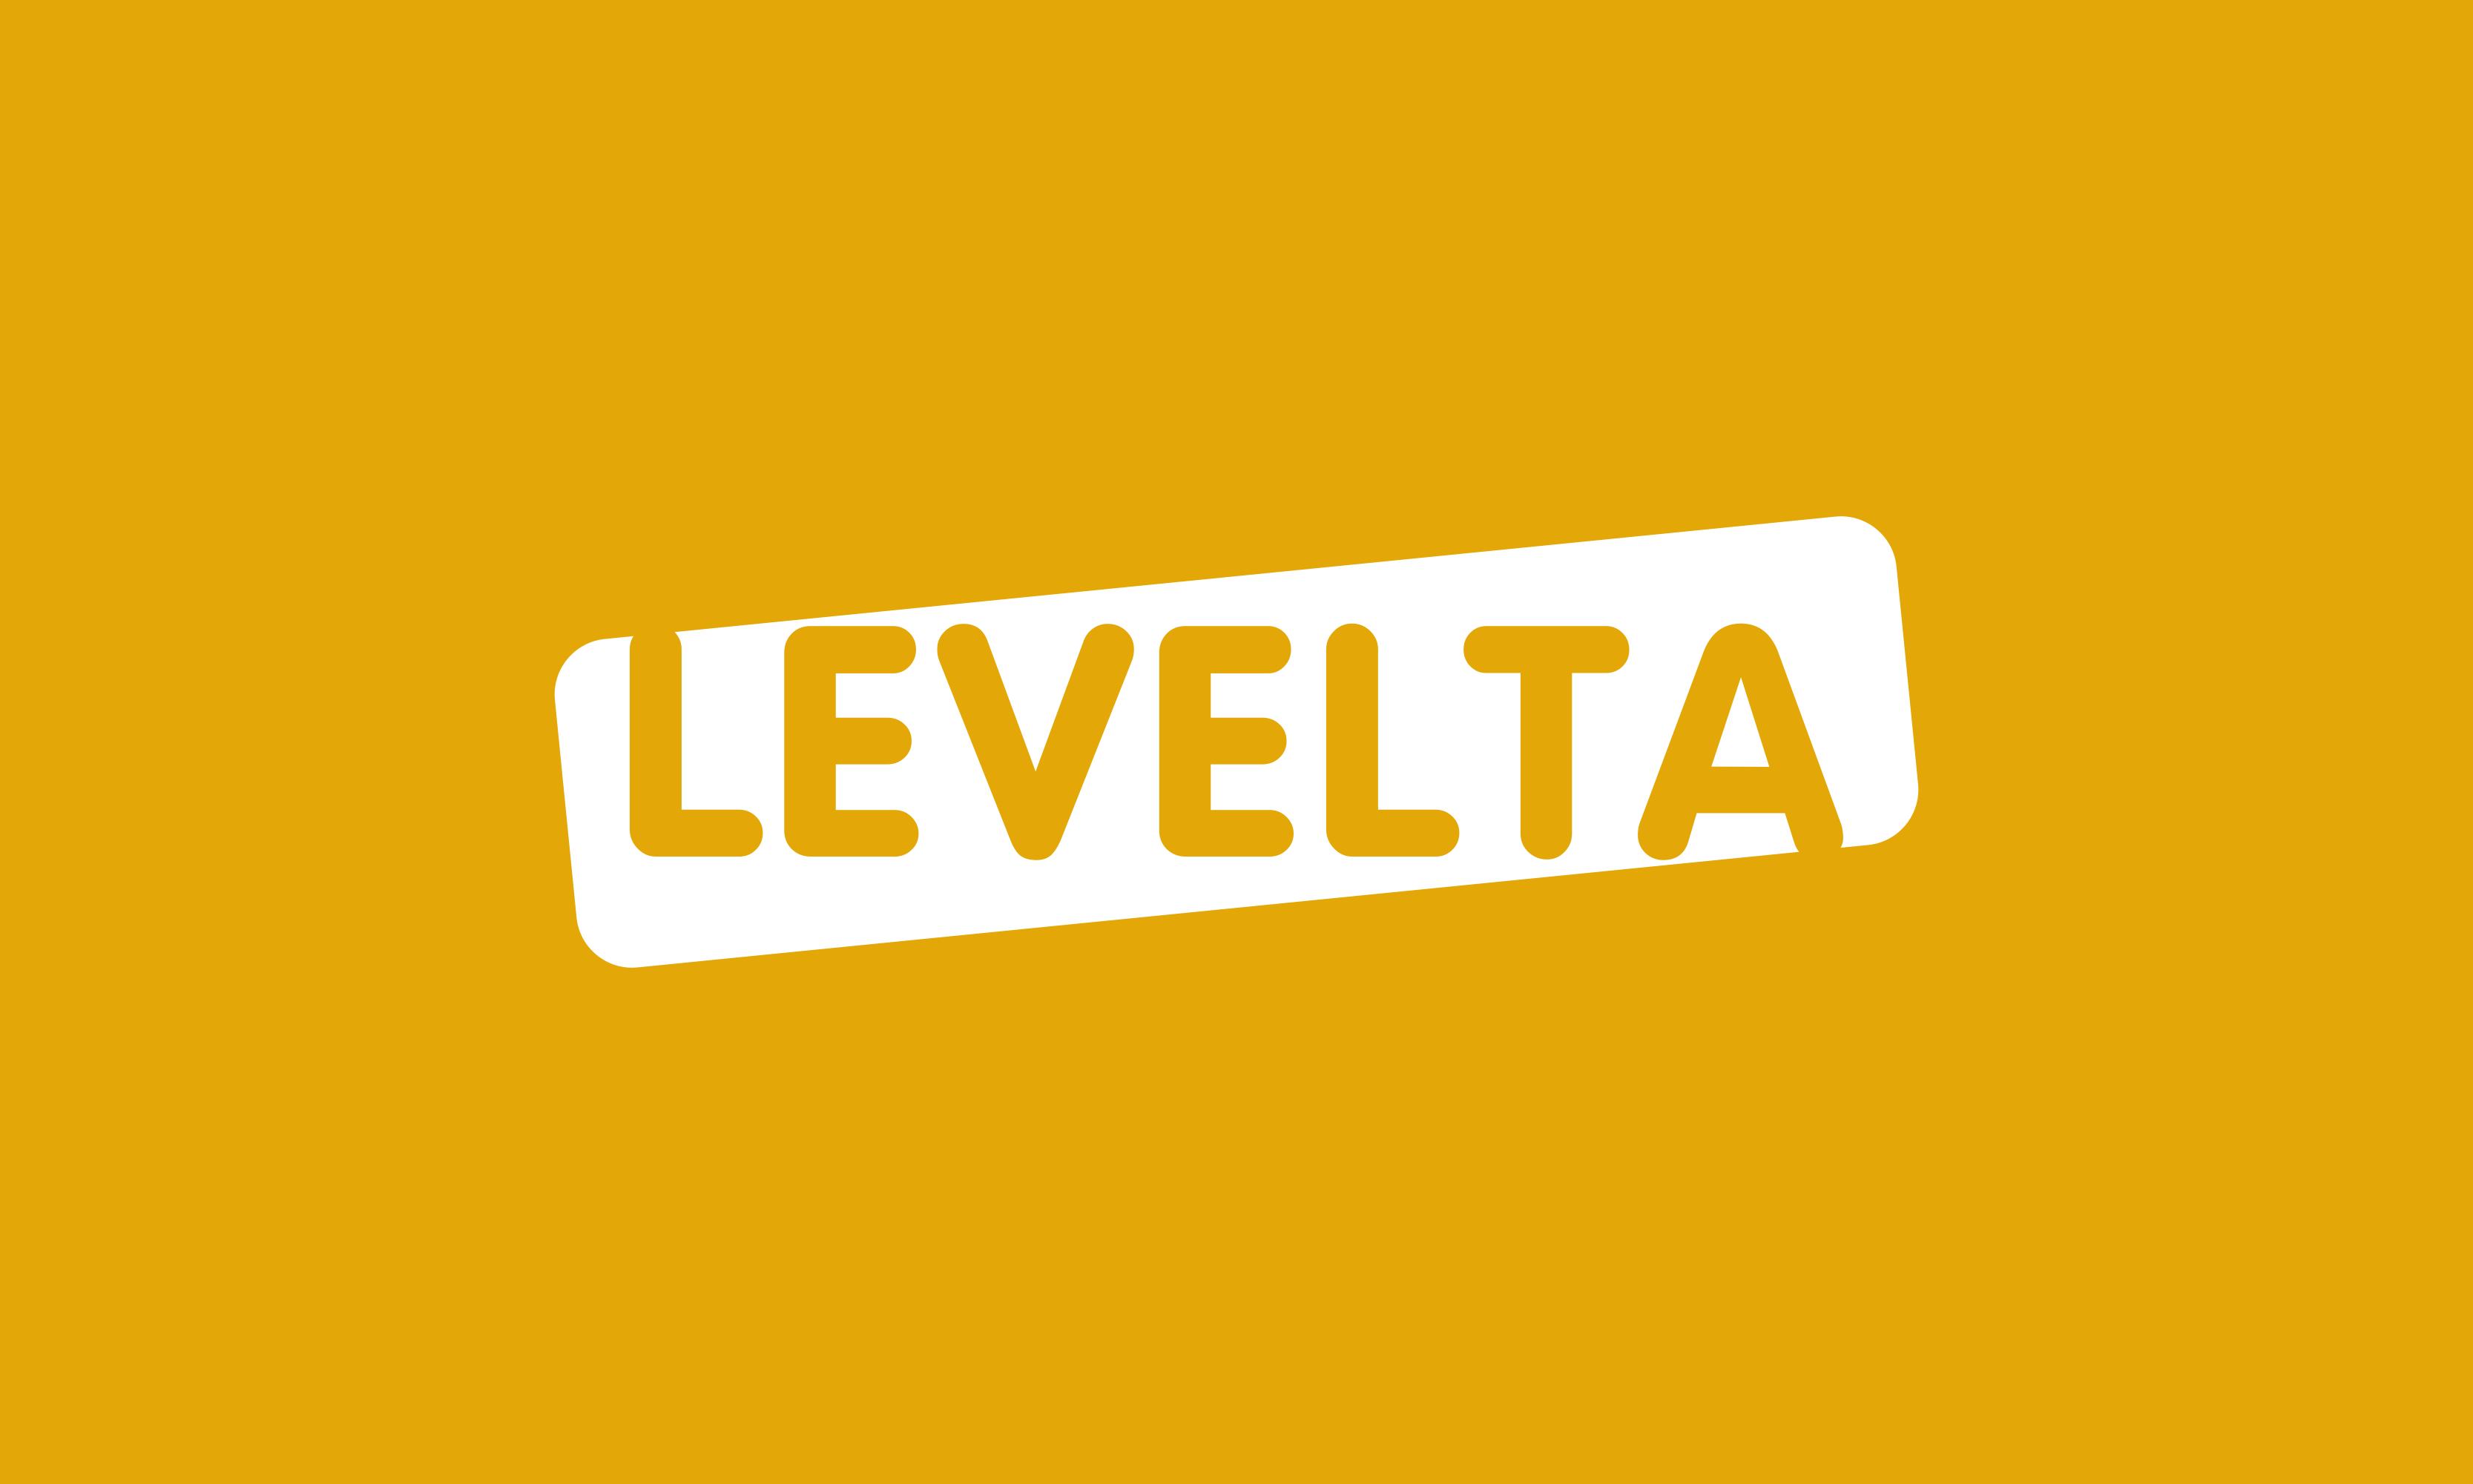 Levelta